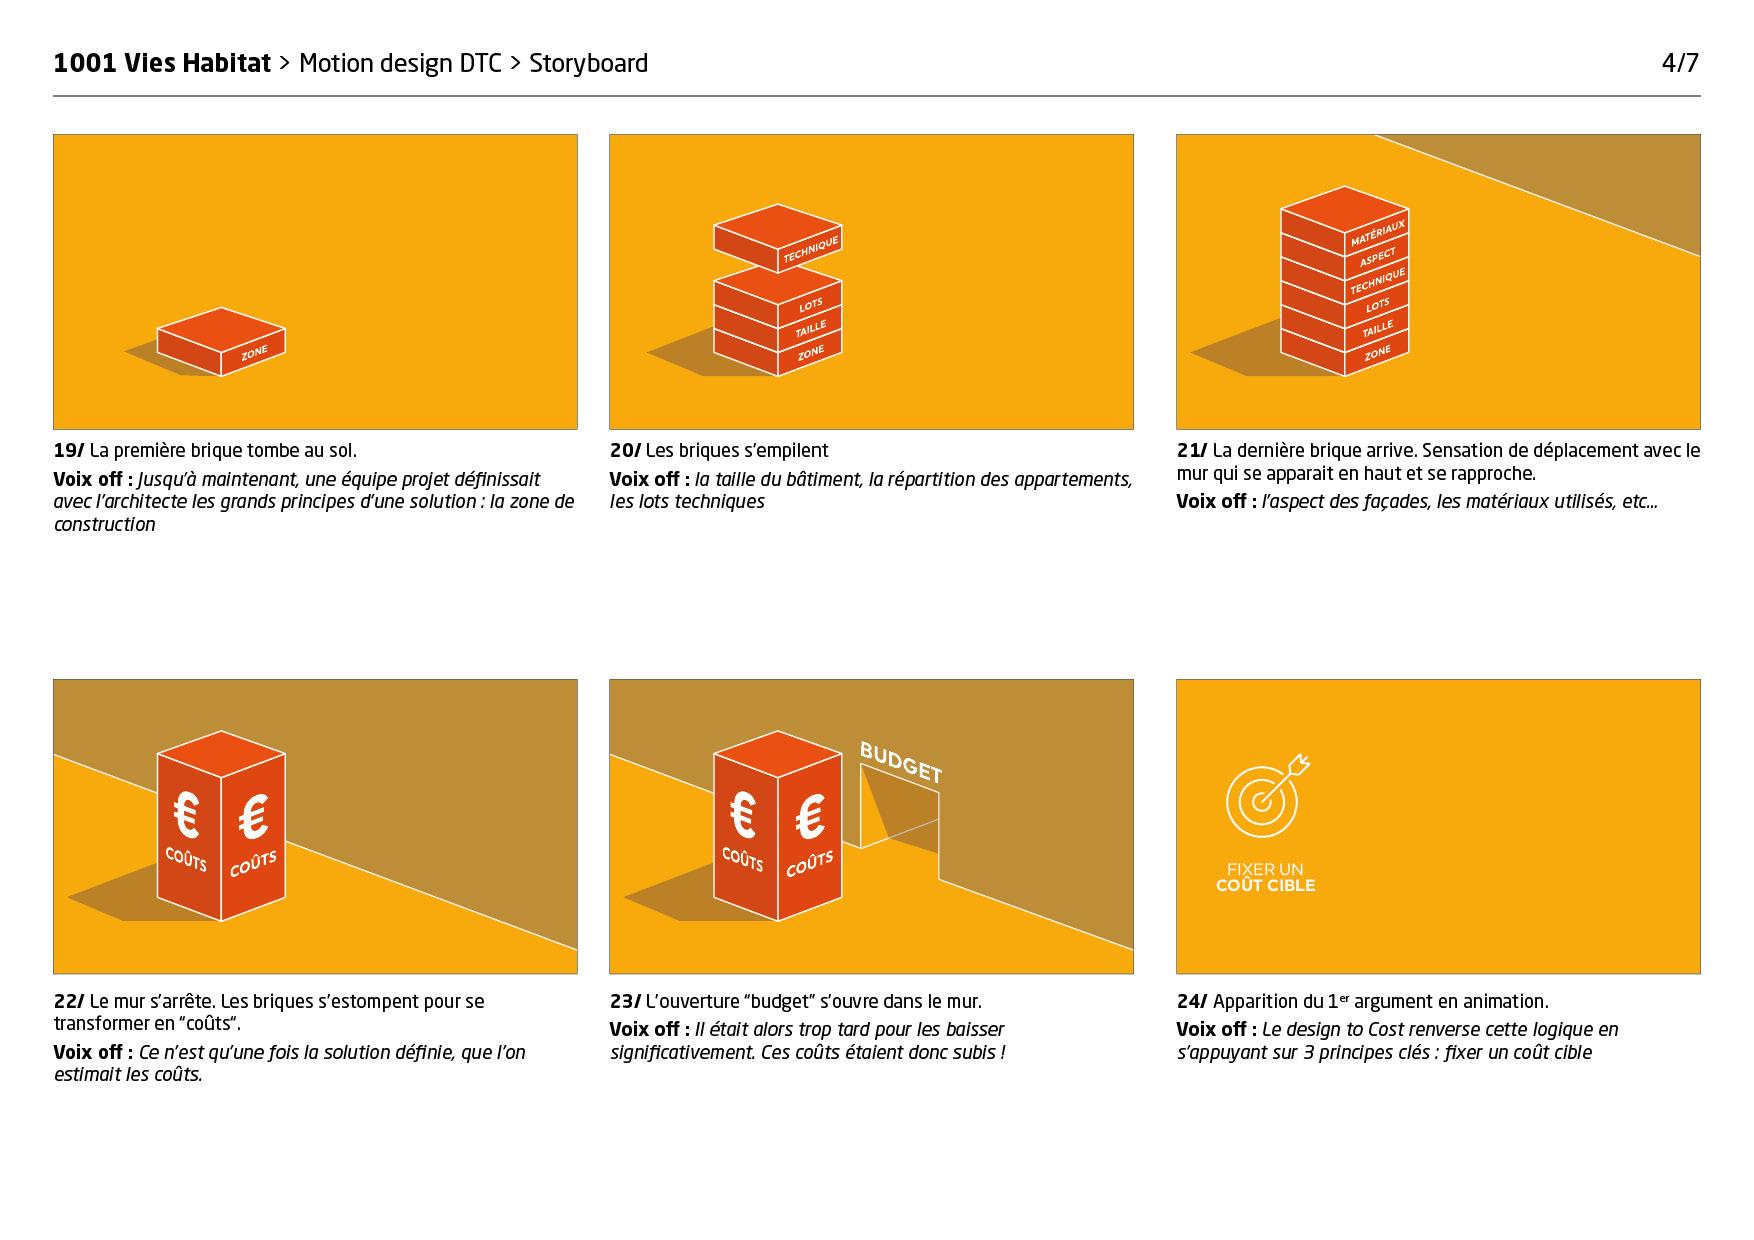 MVH-Motion design DTC Storyboard